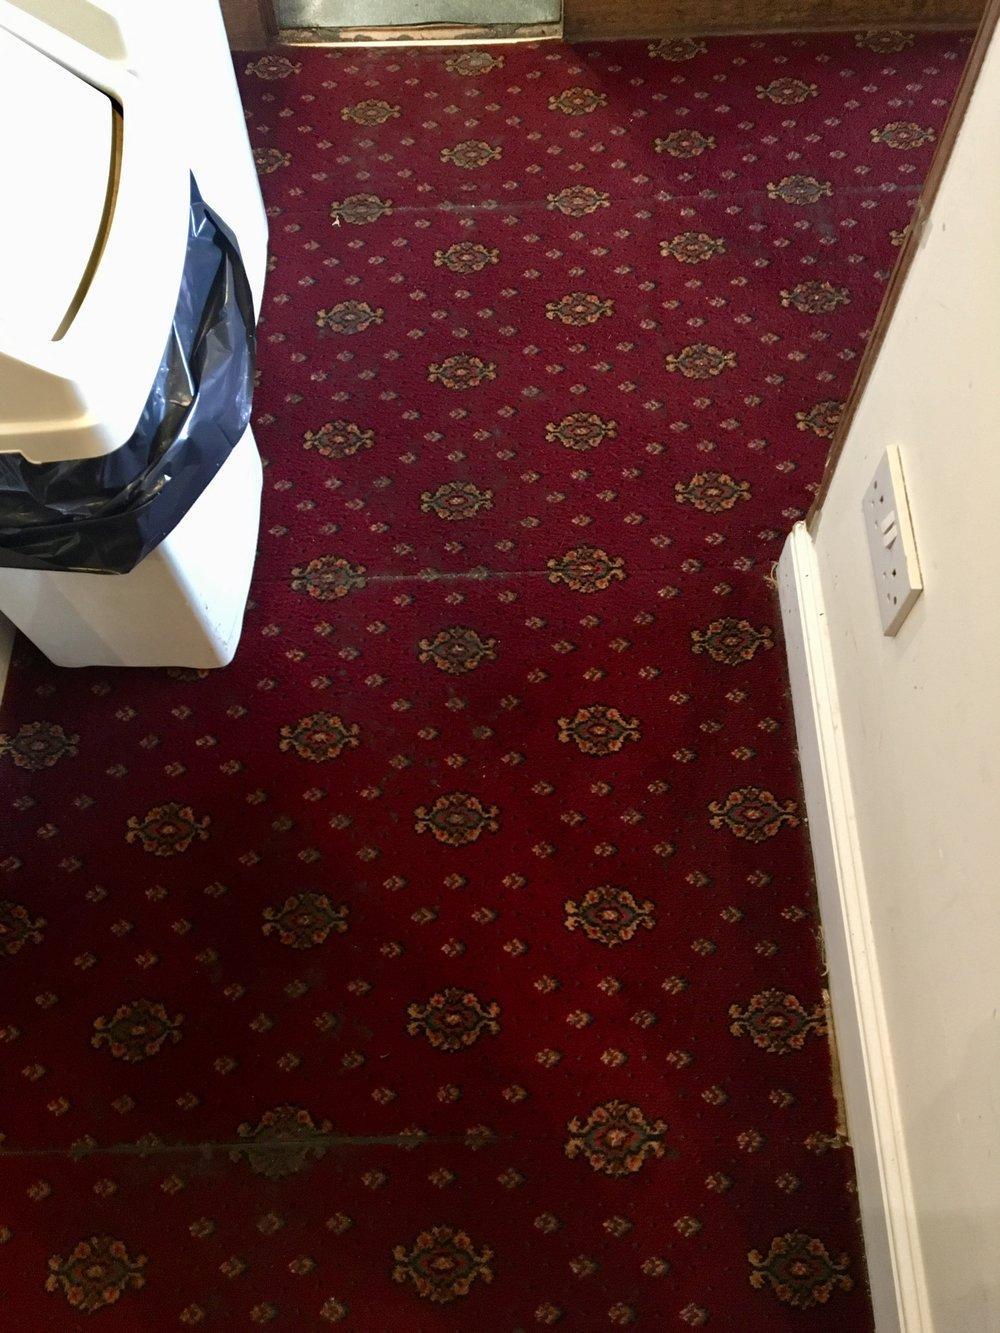 After cleaning pub carpet 'blacktop'